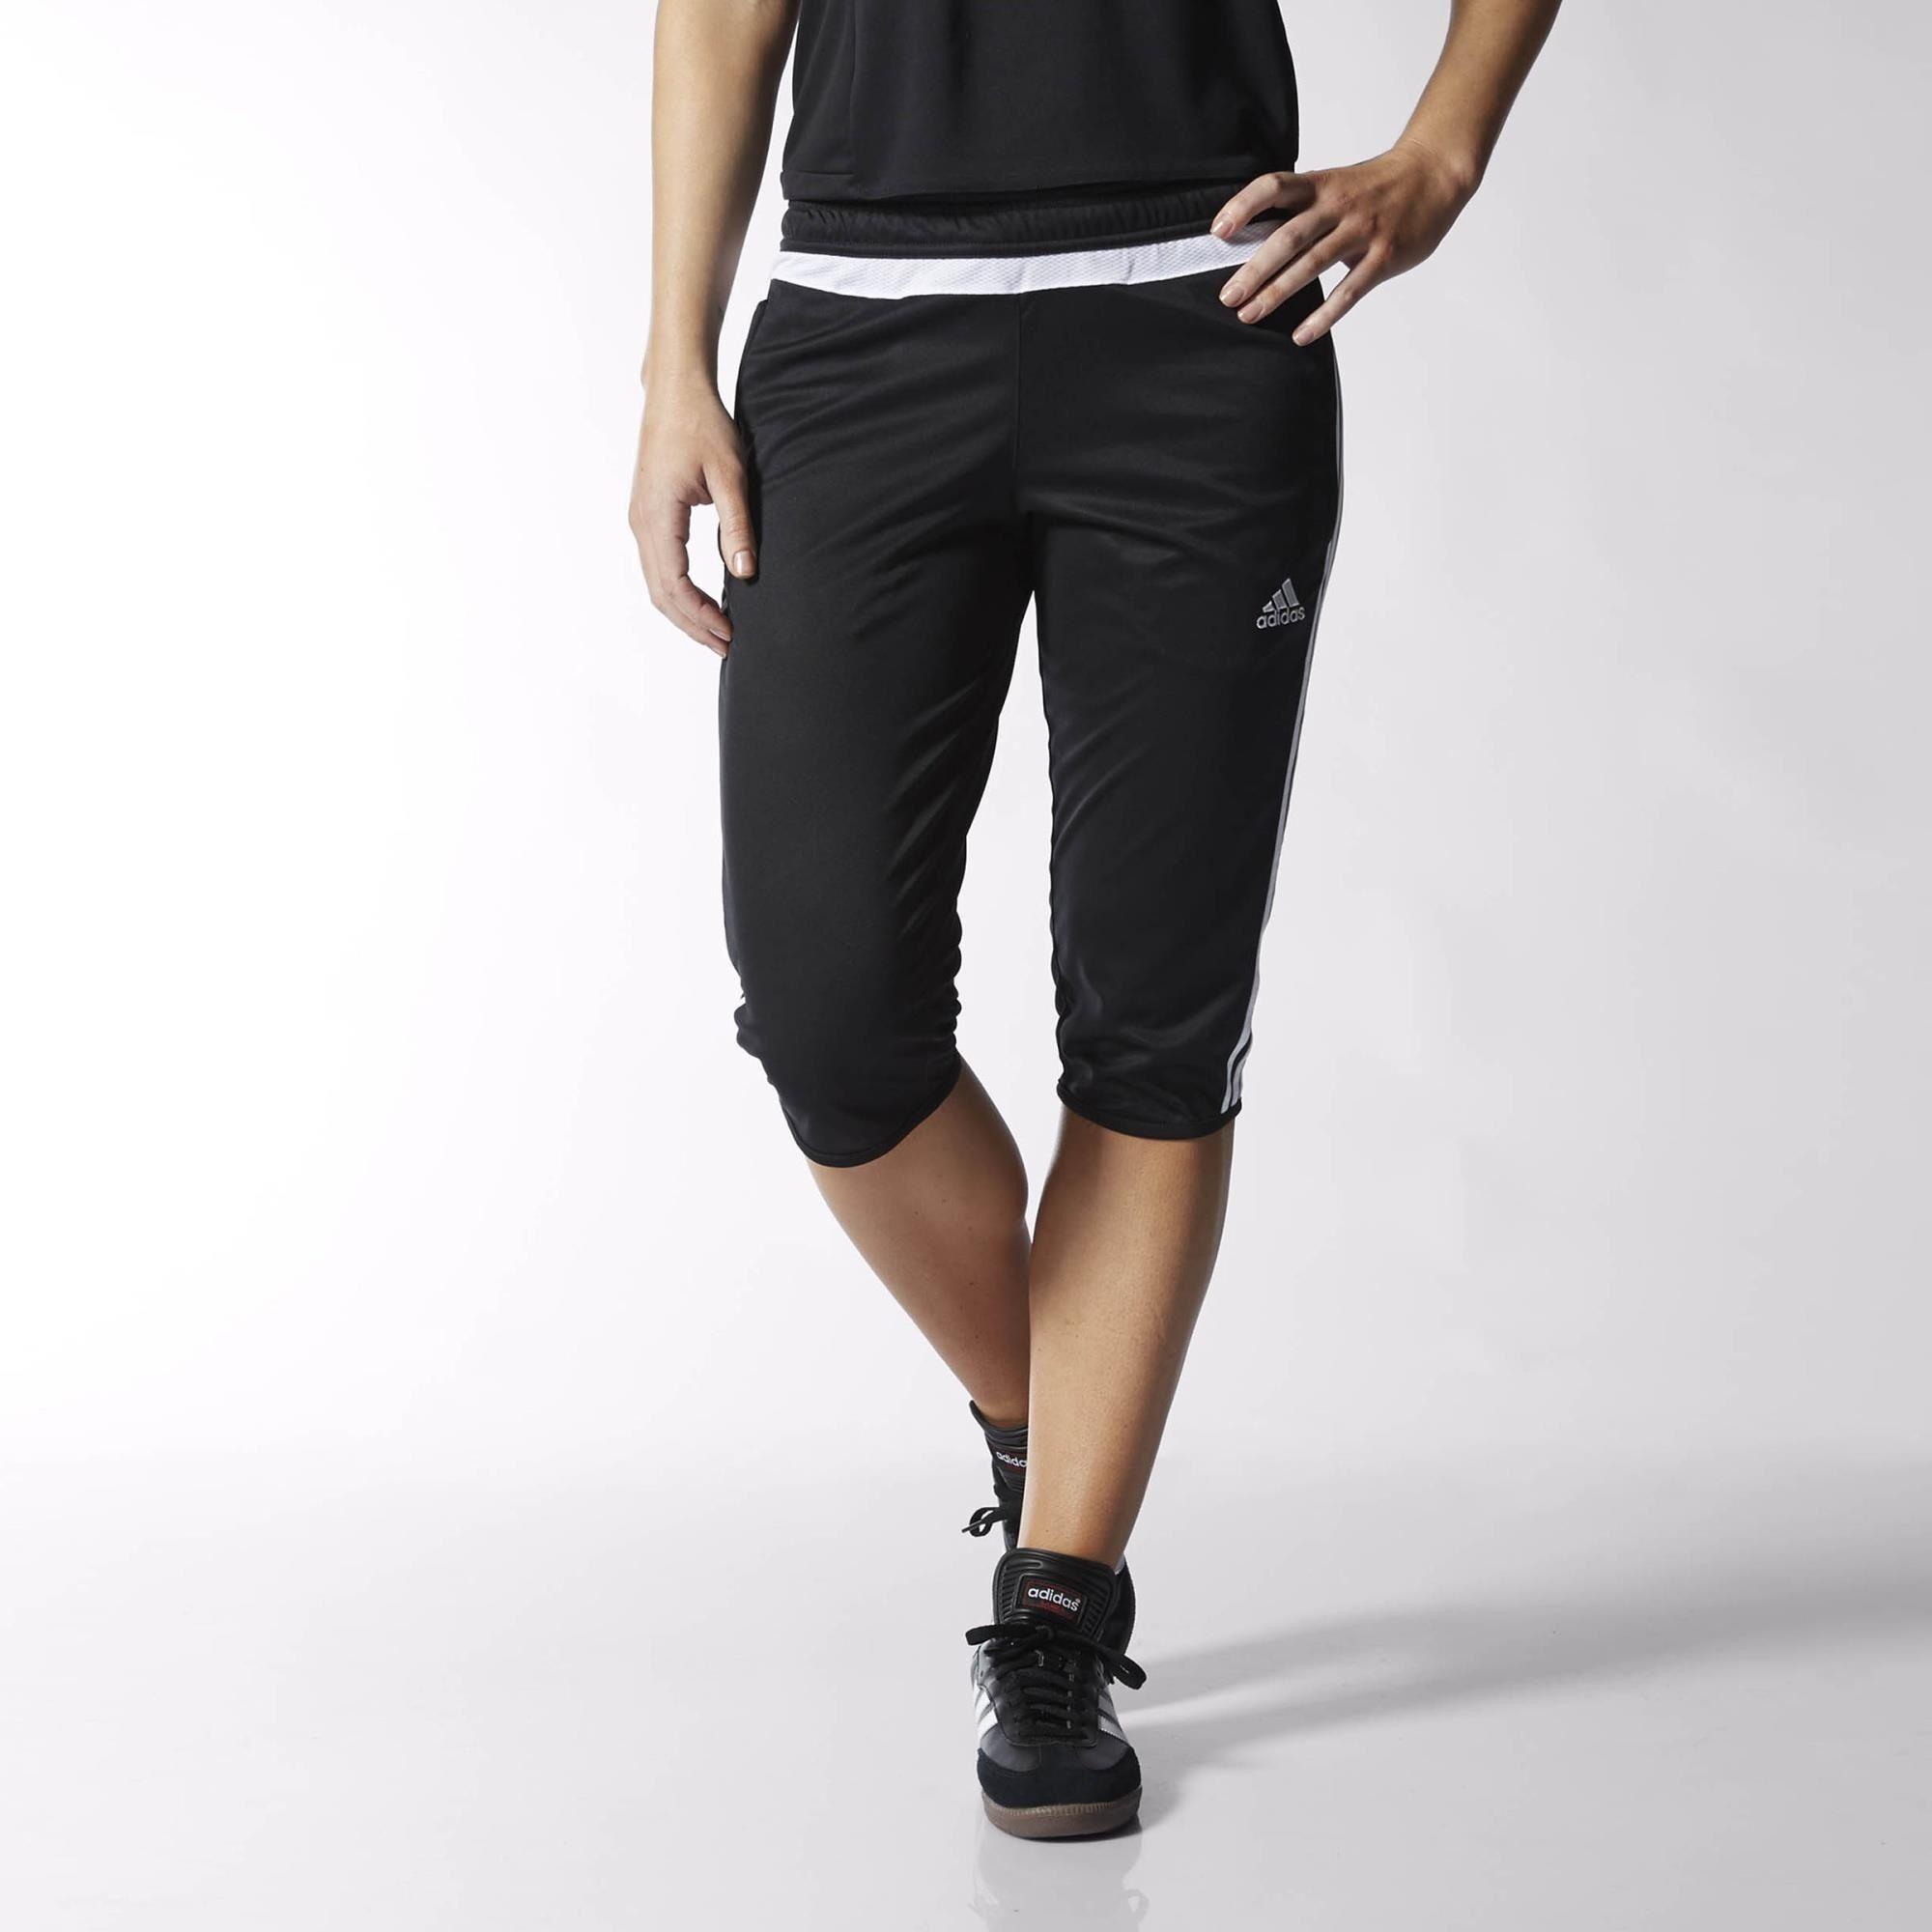 adidas - Women's Tiro 15 Three-Quarter Pants